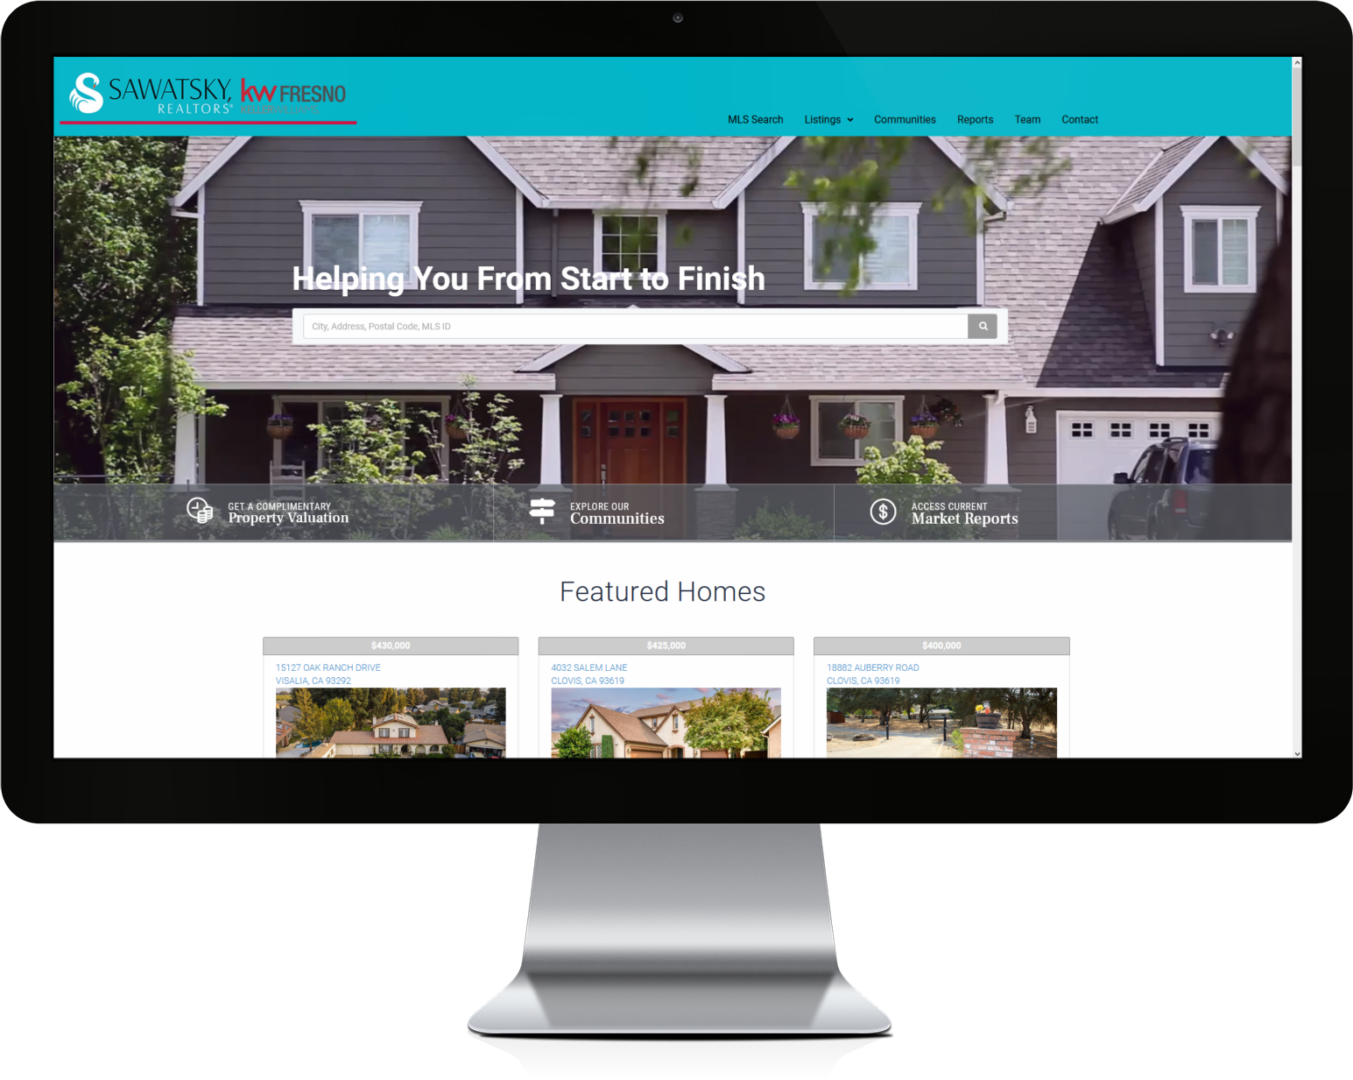 Sawatsky Realtors Custom WordPress IDX Real Estate Website Design by CHEM.digital